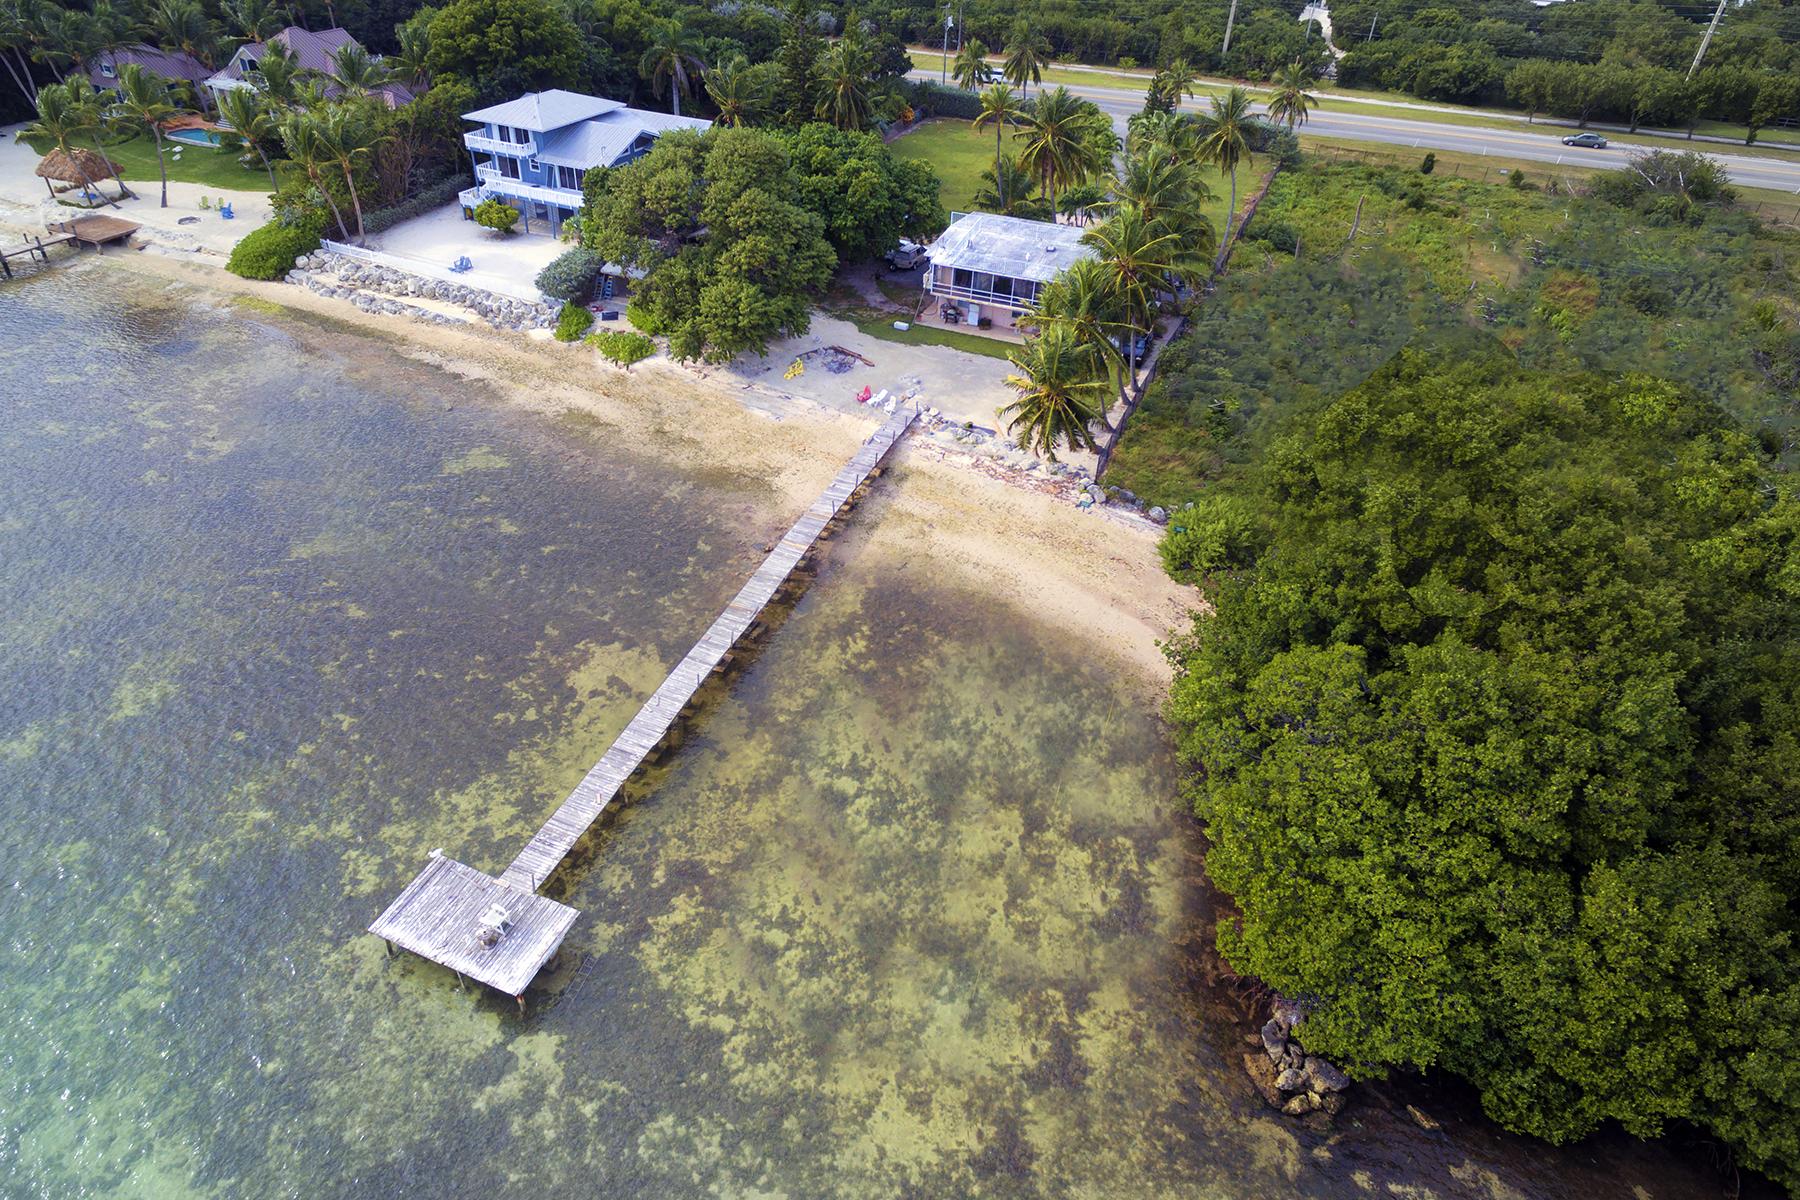 Villa per Vendita alle ore Premier Location 77401 Overseas Highway Florida Keys, Islamorada, Florida, 33036 Stati Uniti